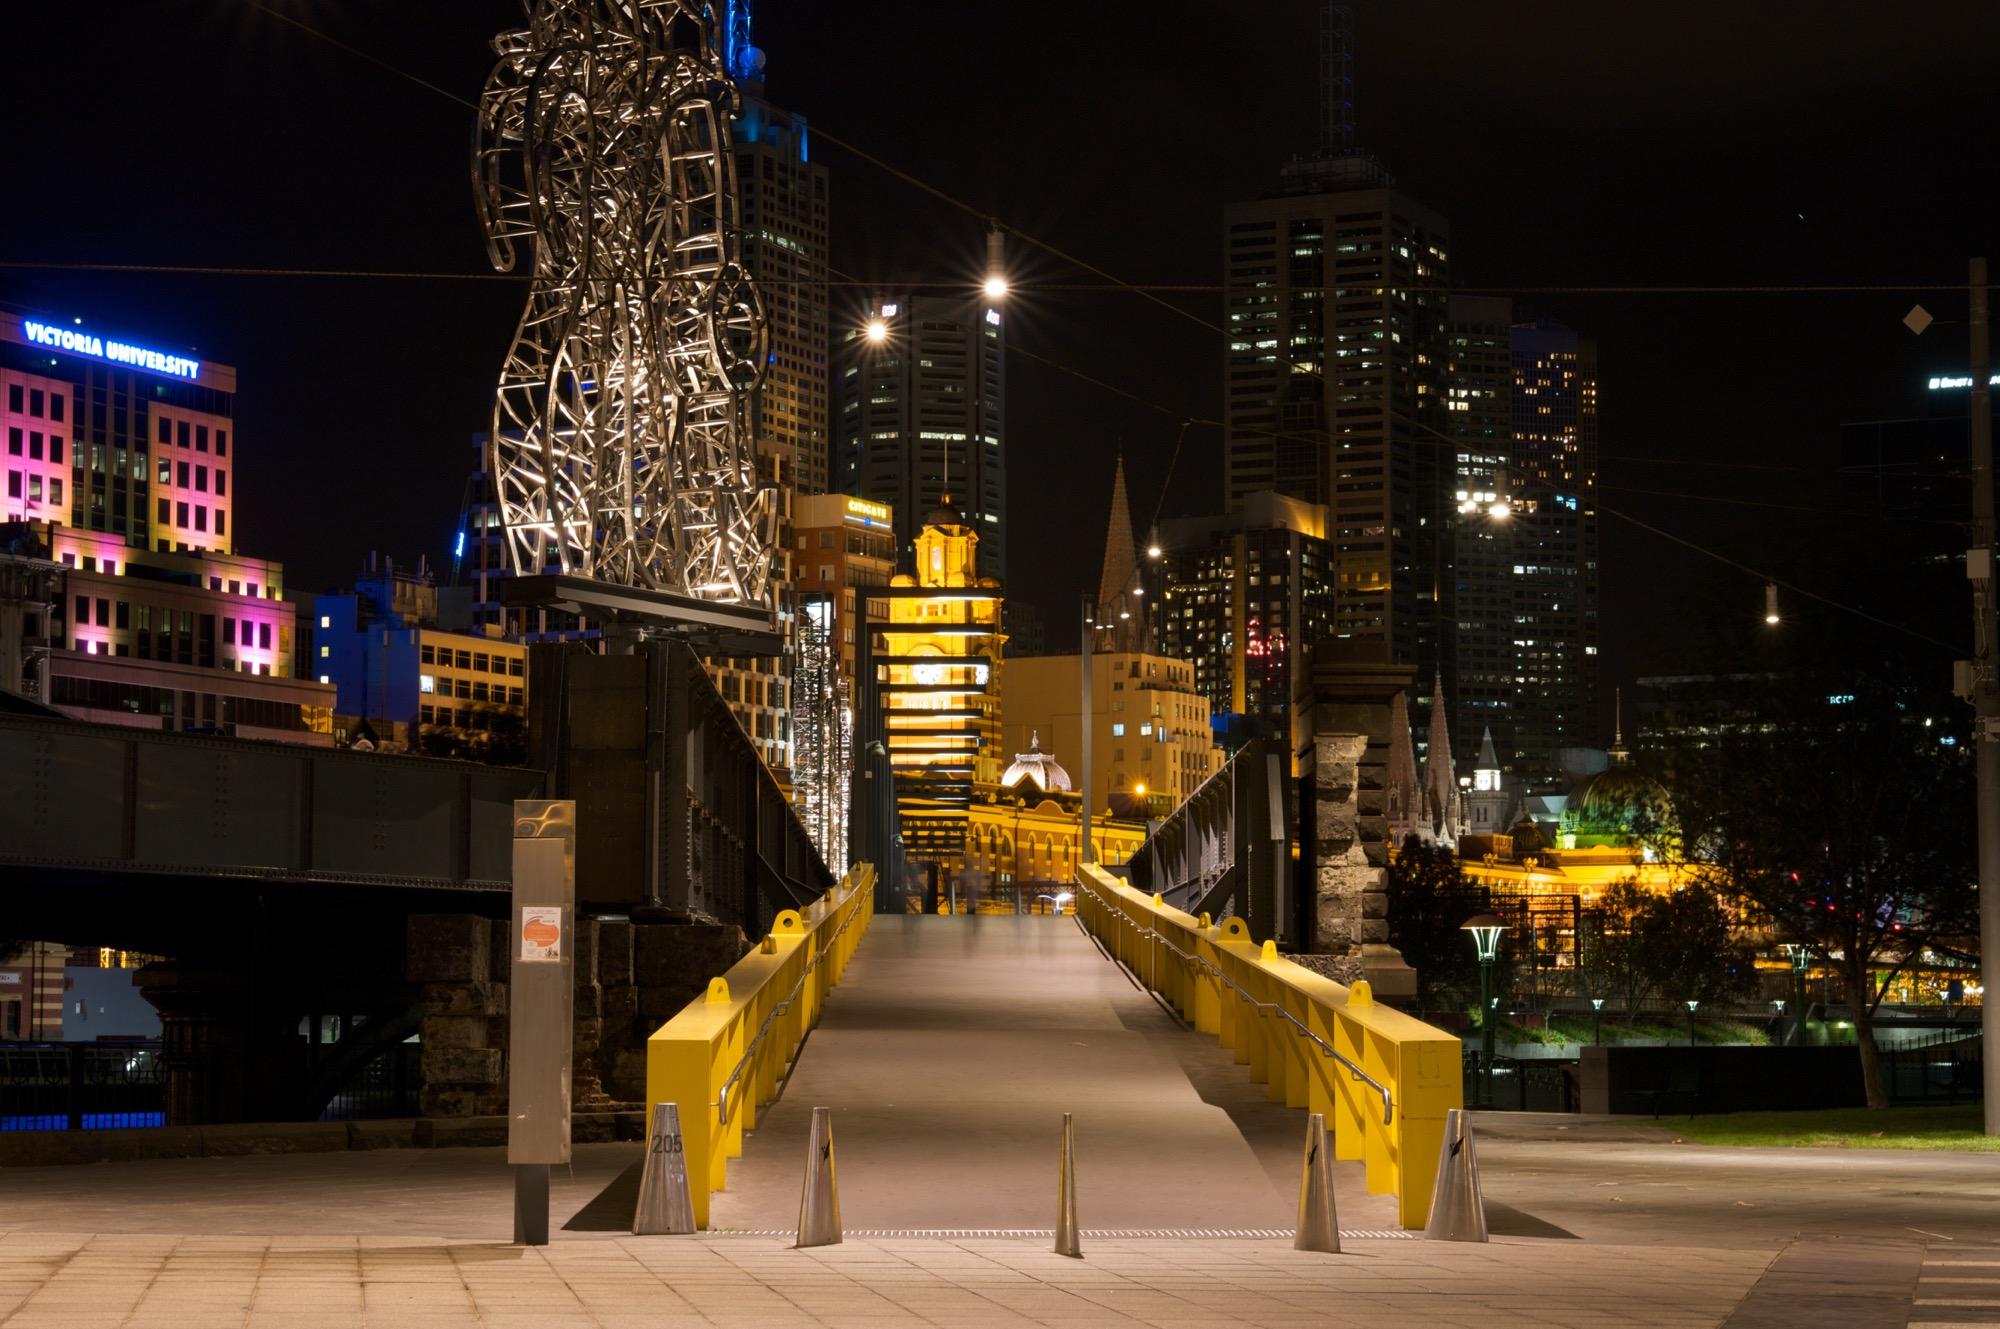 Melbourne stuff - 1 of 223 (219).jpg